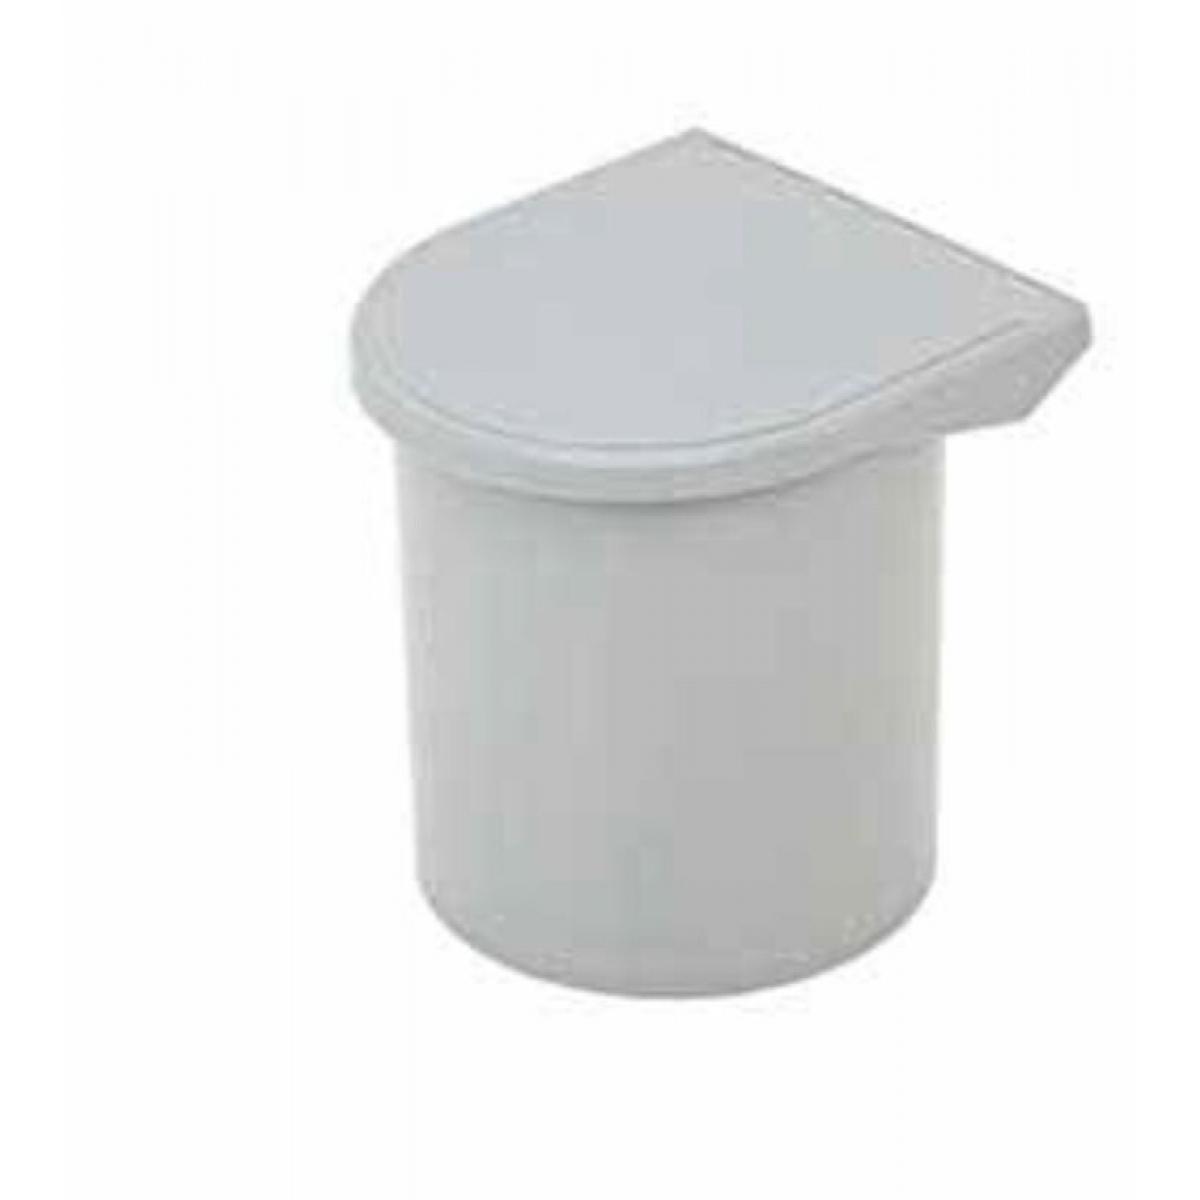 Ведро для базы от 400мм, 10л, пластик, *цвет- серый